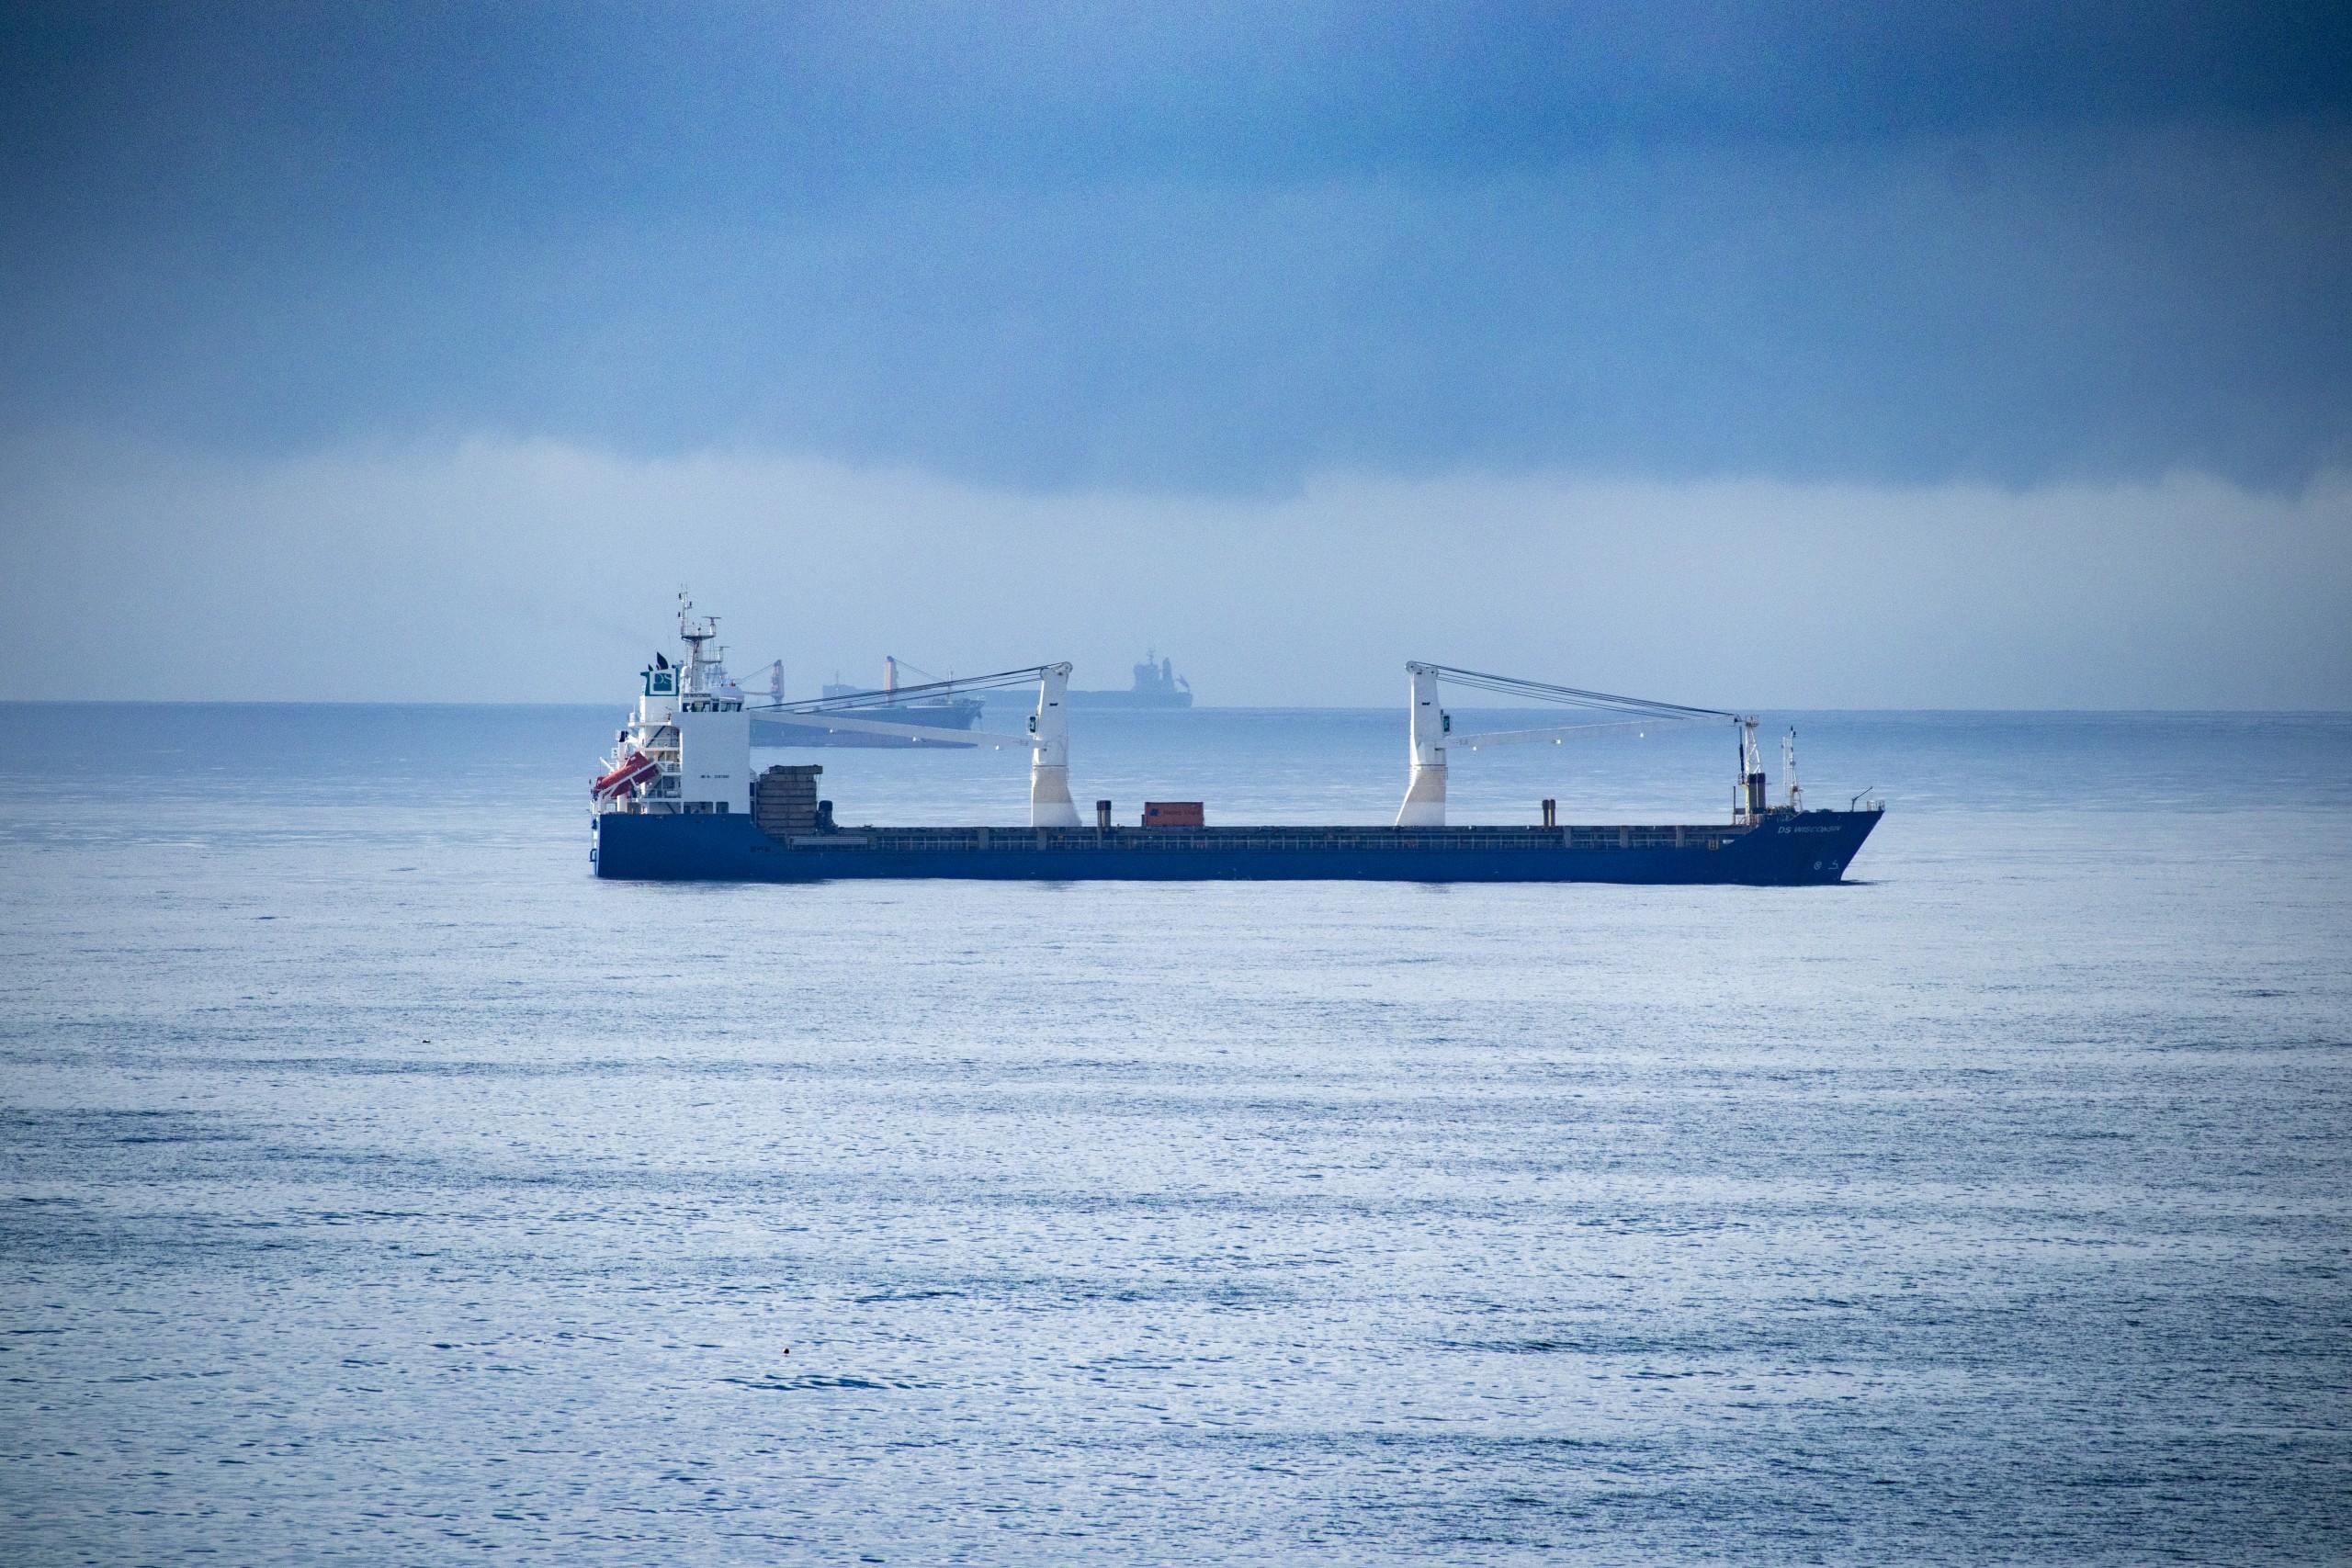 Ship and overcast sea